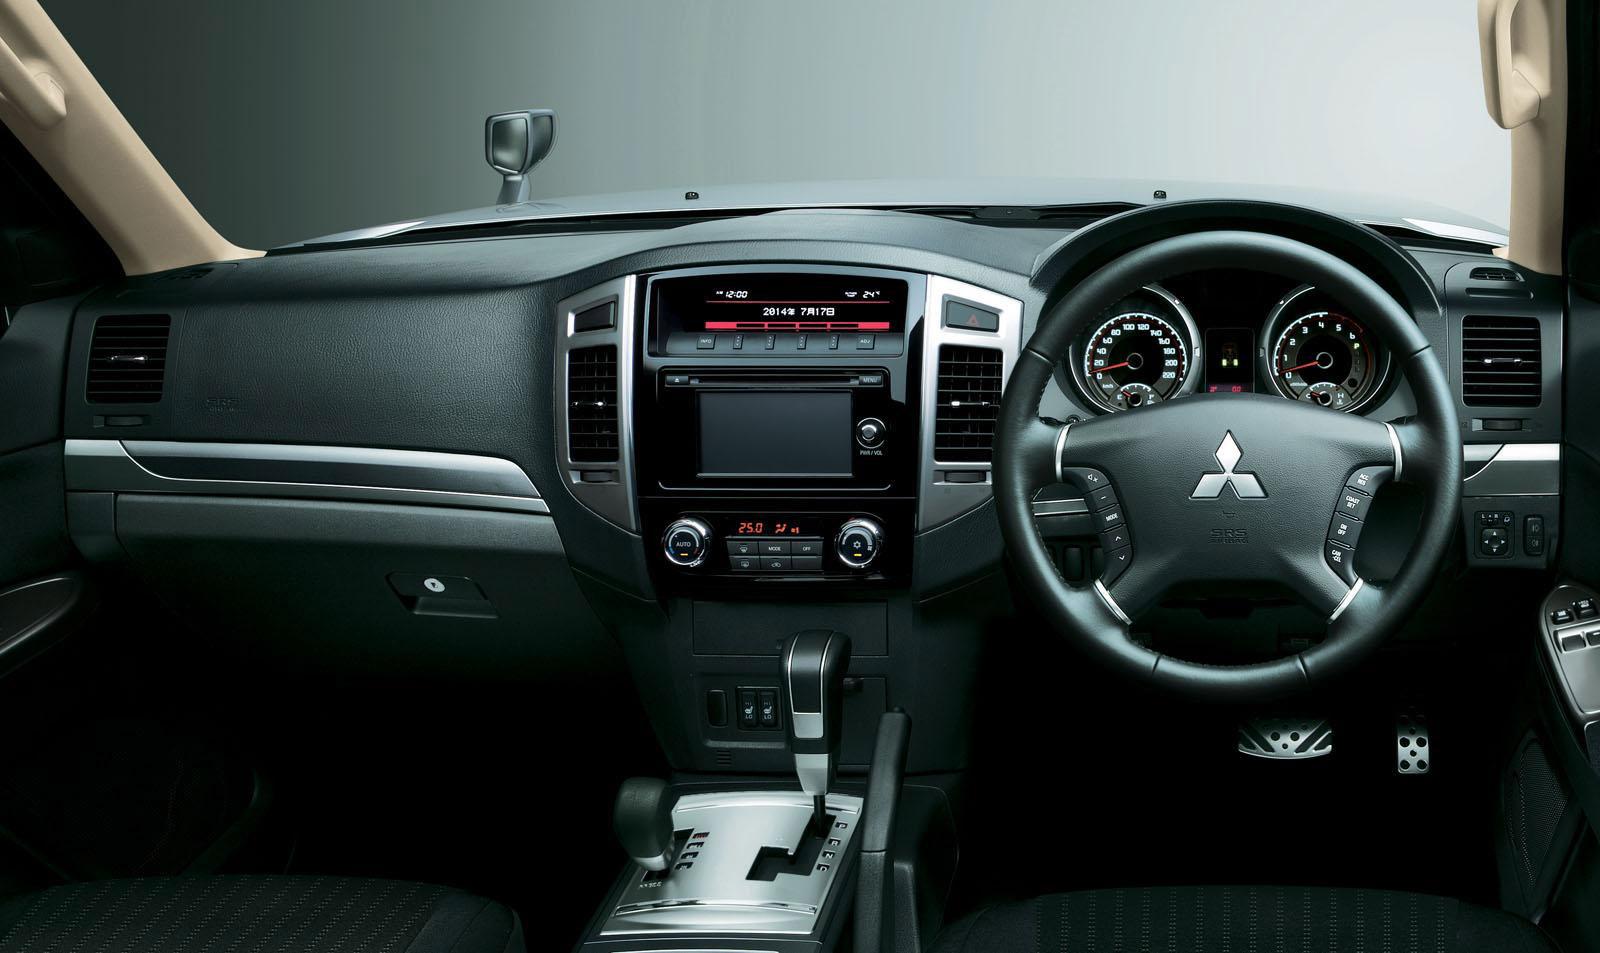 2015 Mitsubishi Outlander Sport >> 2015 Mitsubishi Pajero Facelift